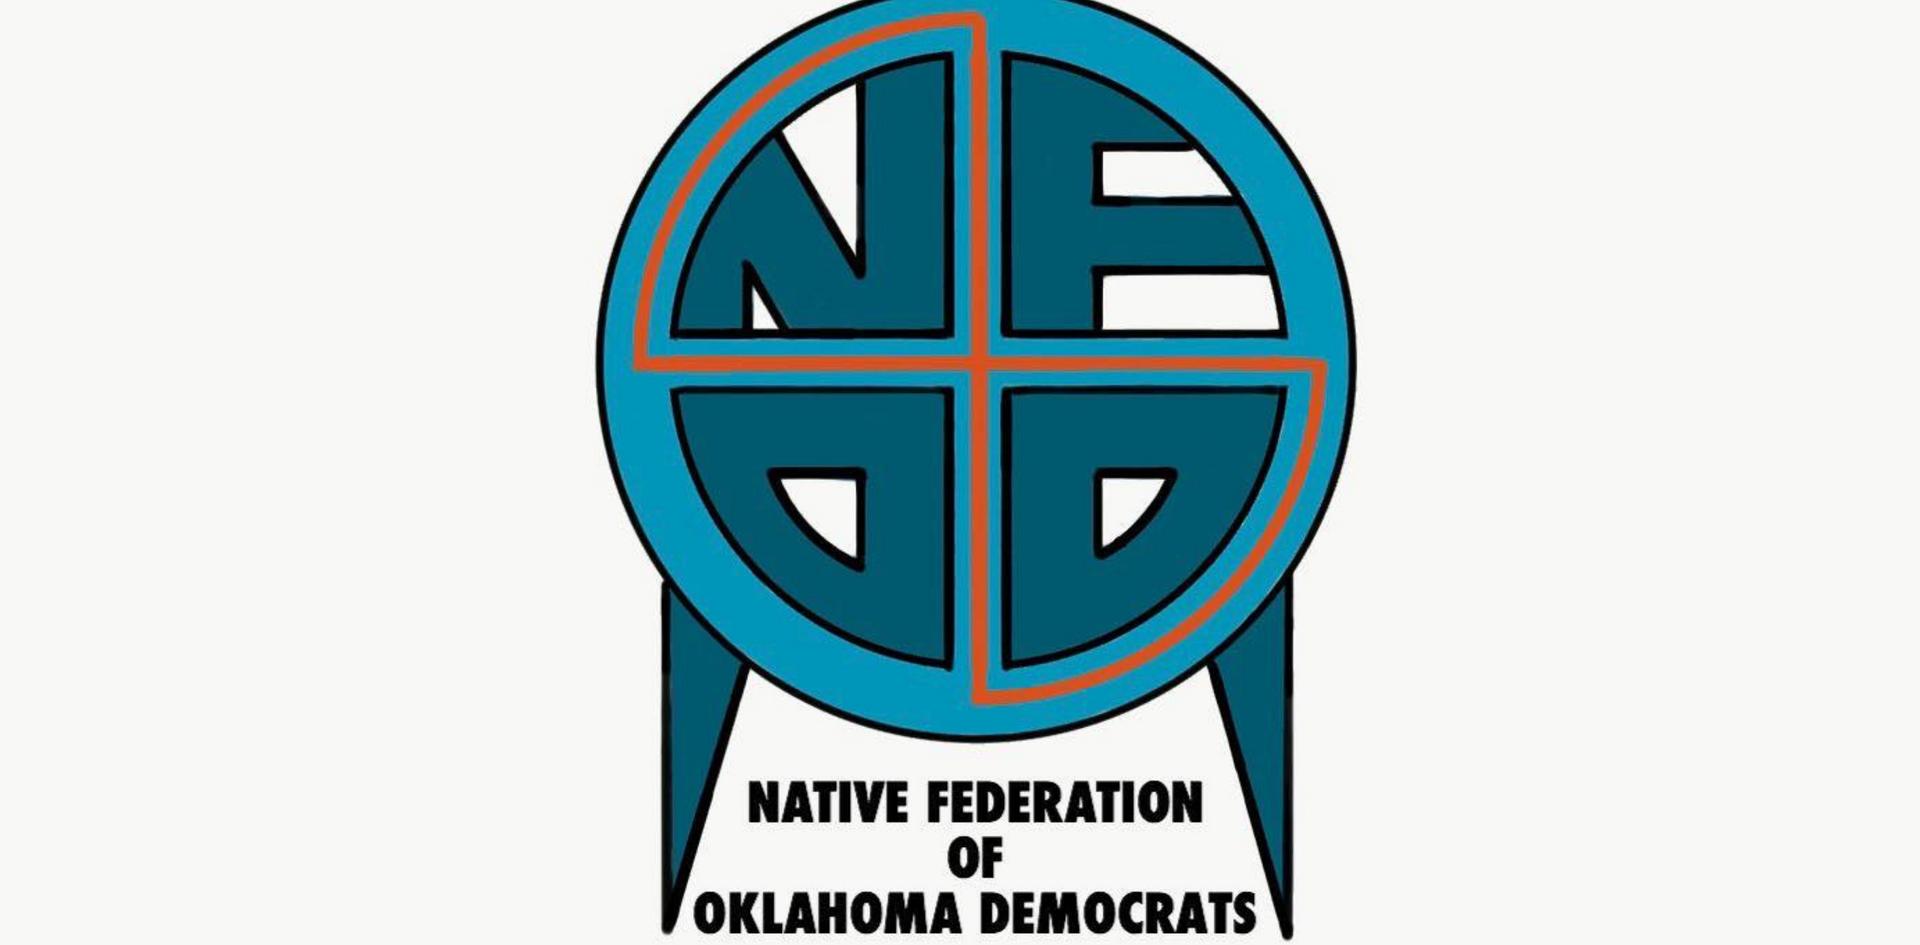 Native Federation of Oklahoma Democrats Facebook Page